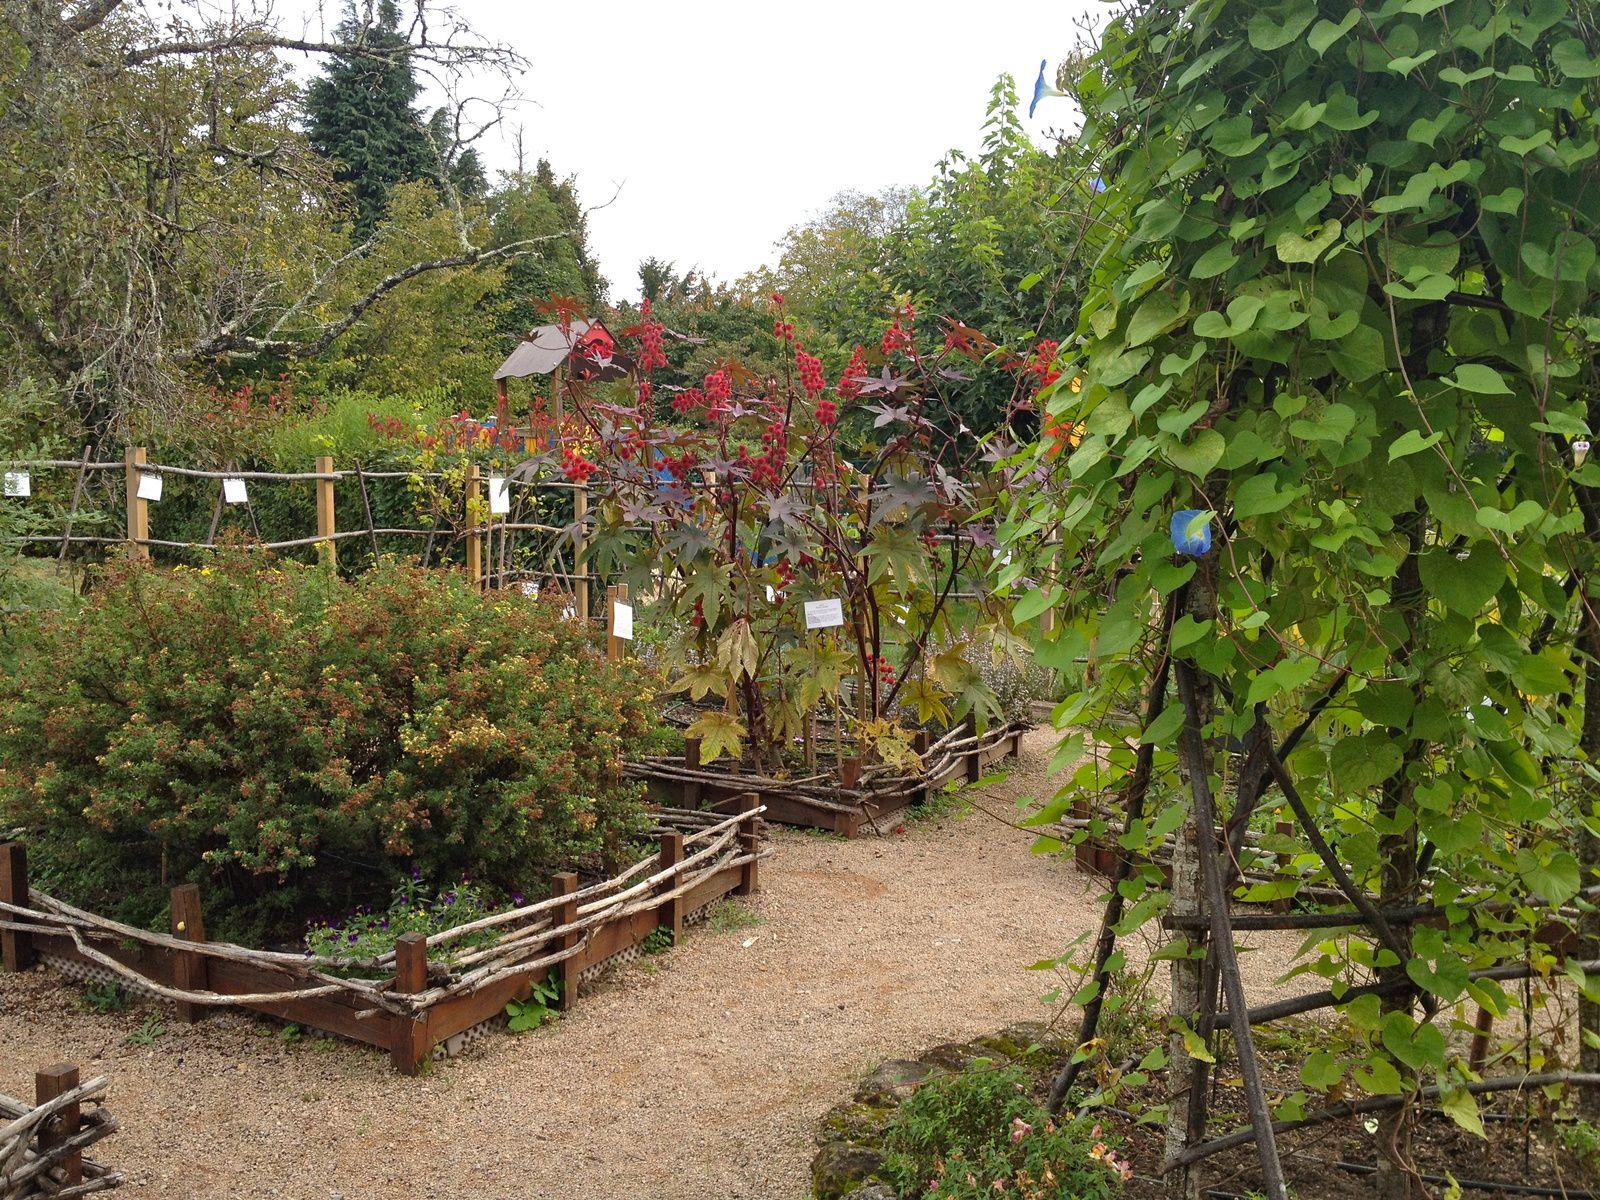 Le jardin m di val de cardaillac lot jardins merveilleux for Jardin medieval